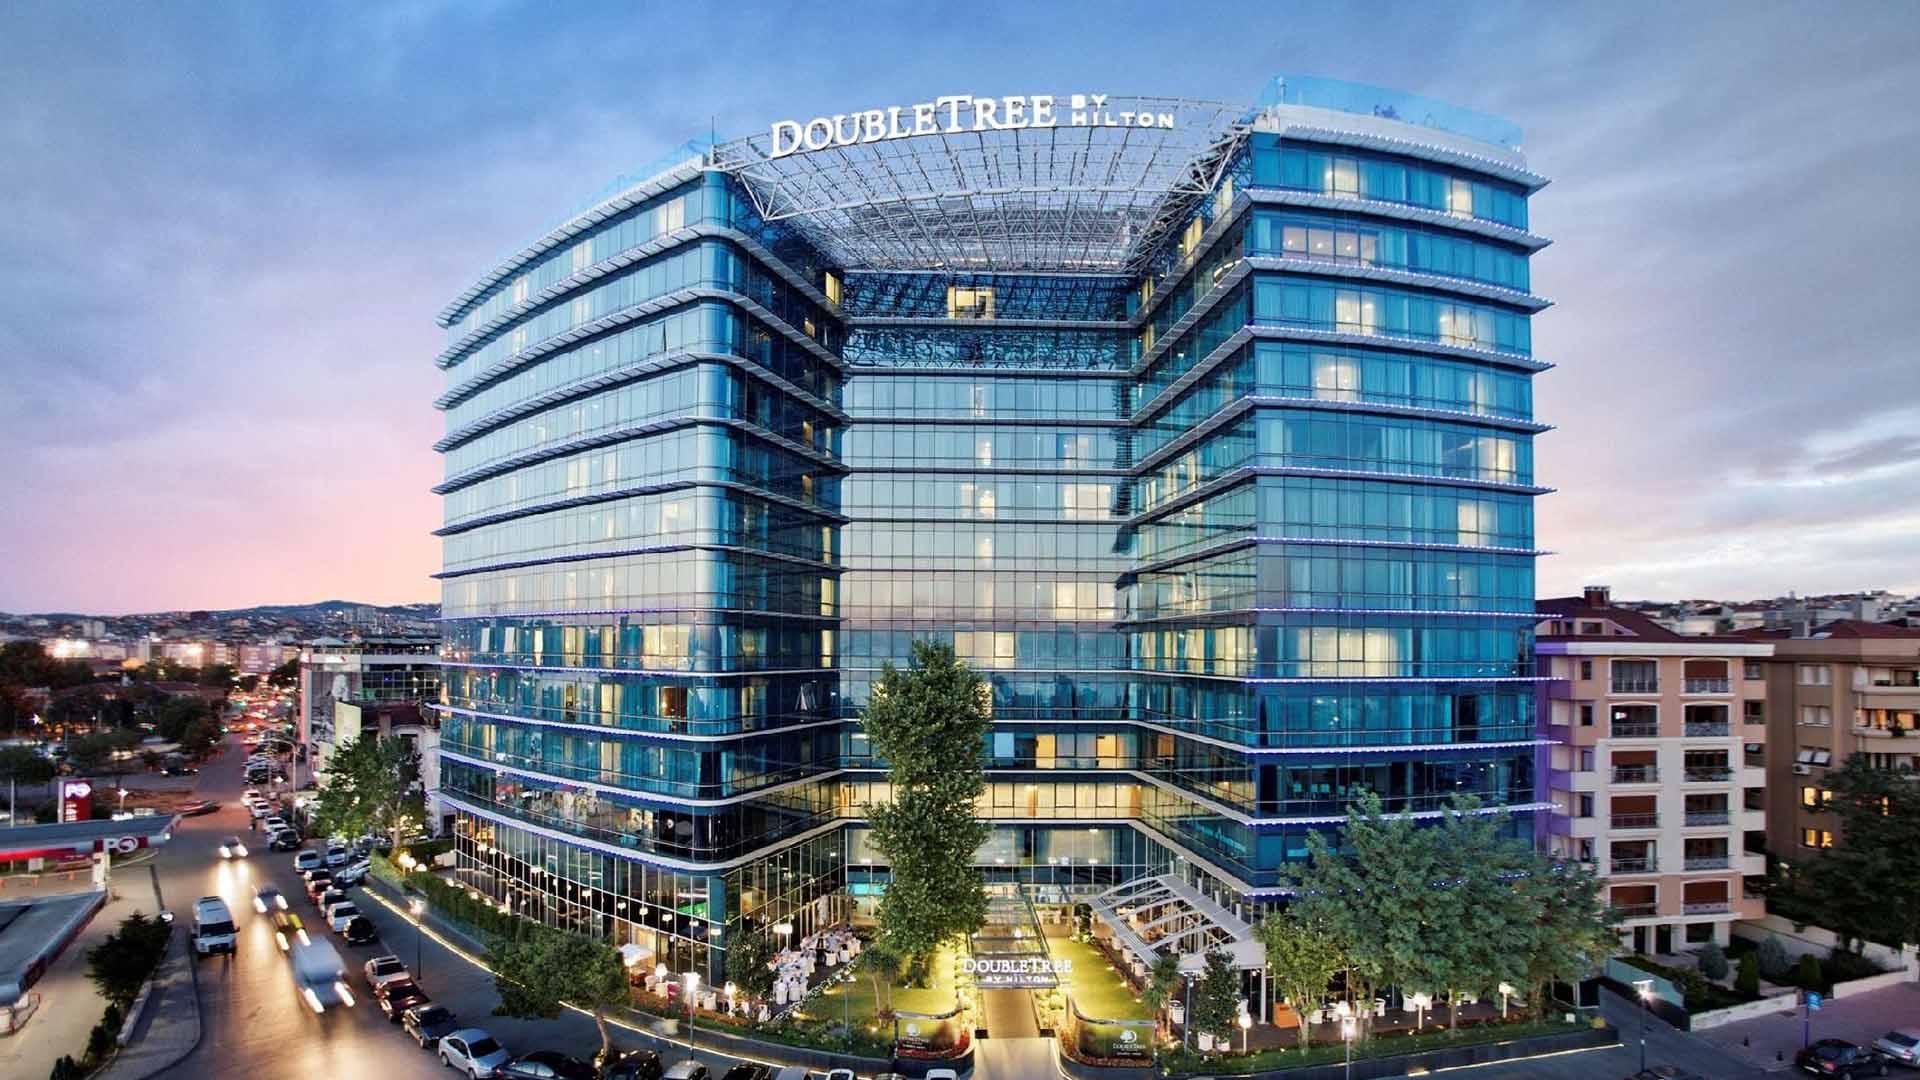 DoubleTree Hilton Moda